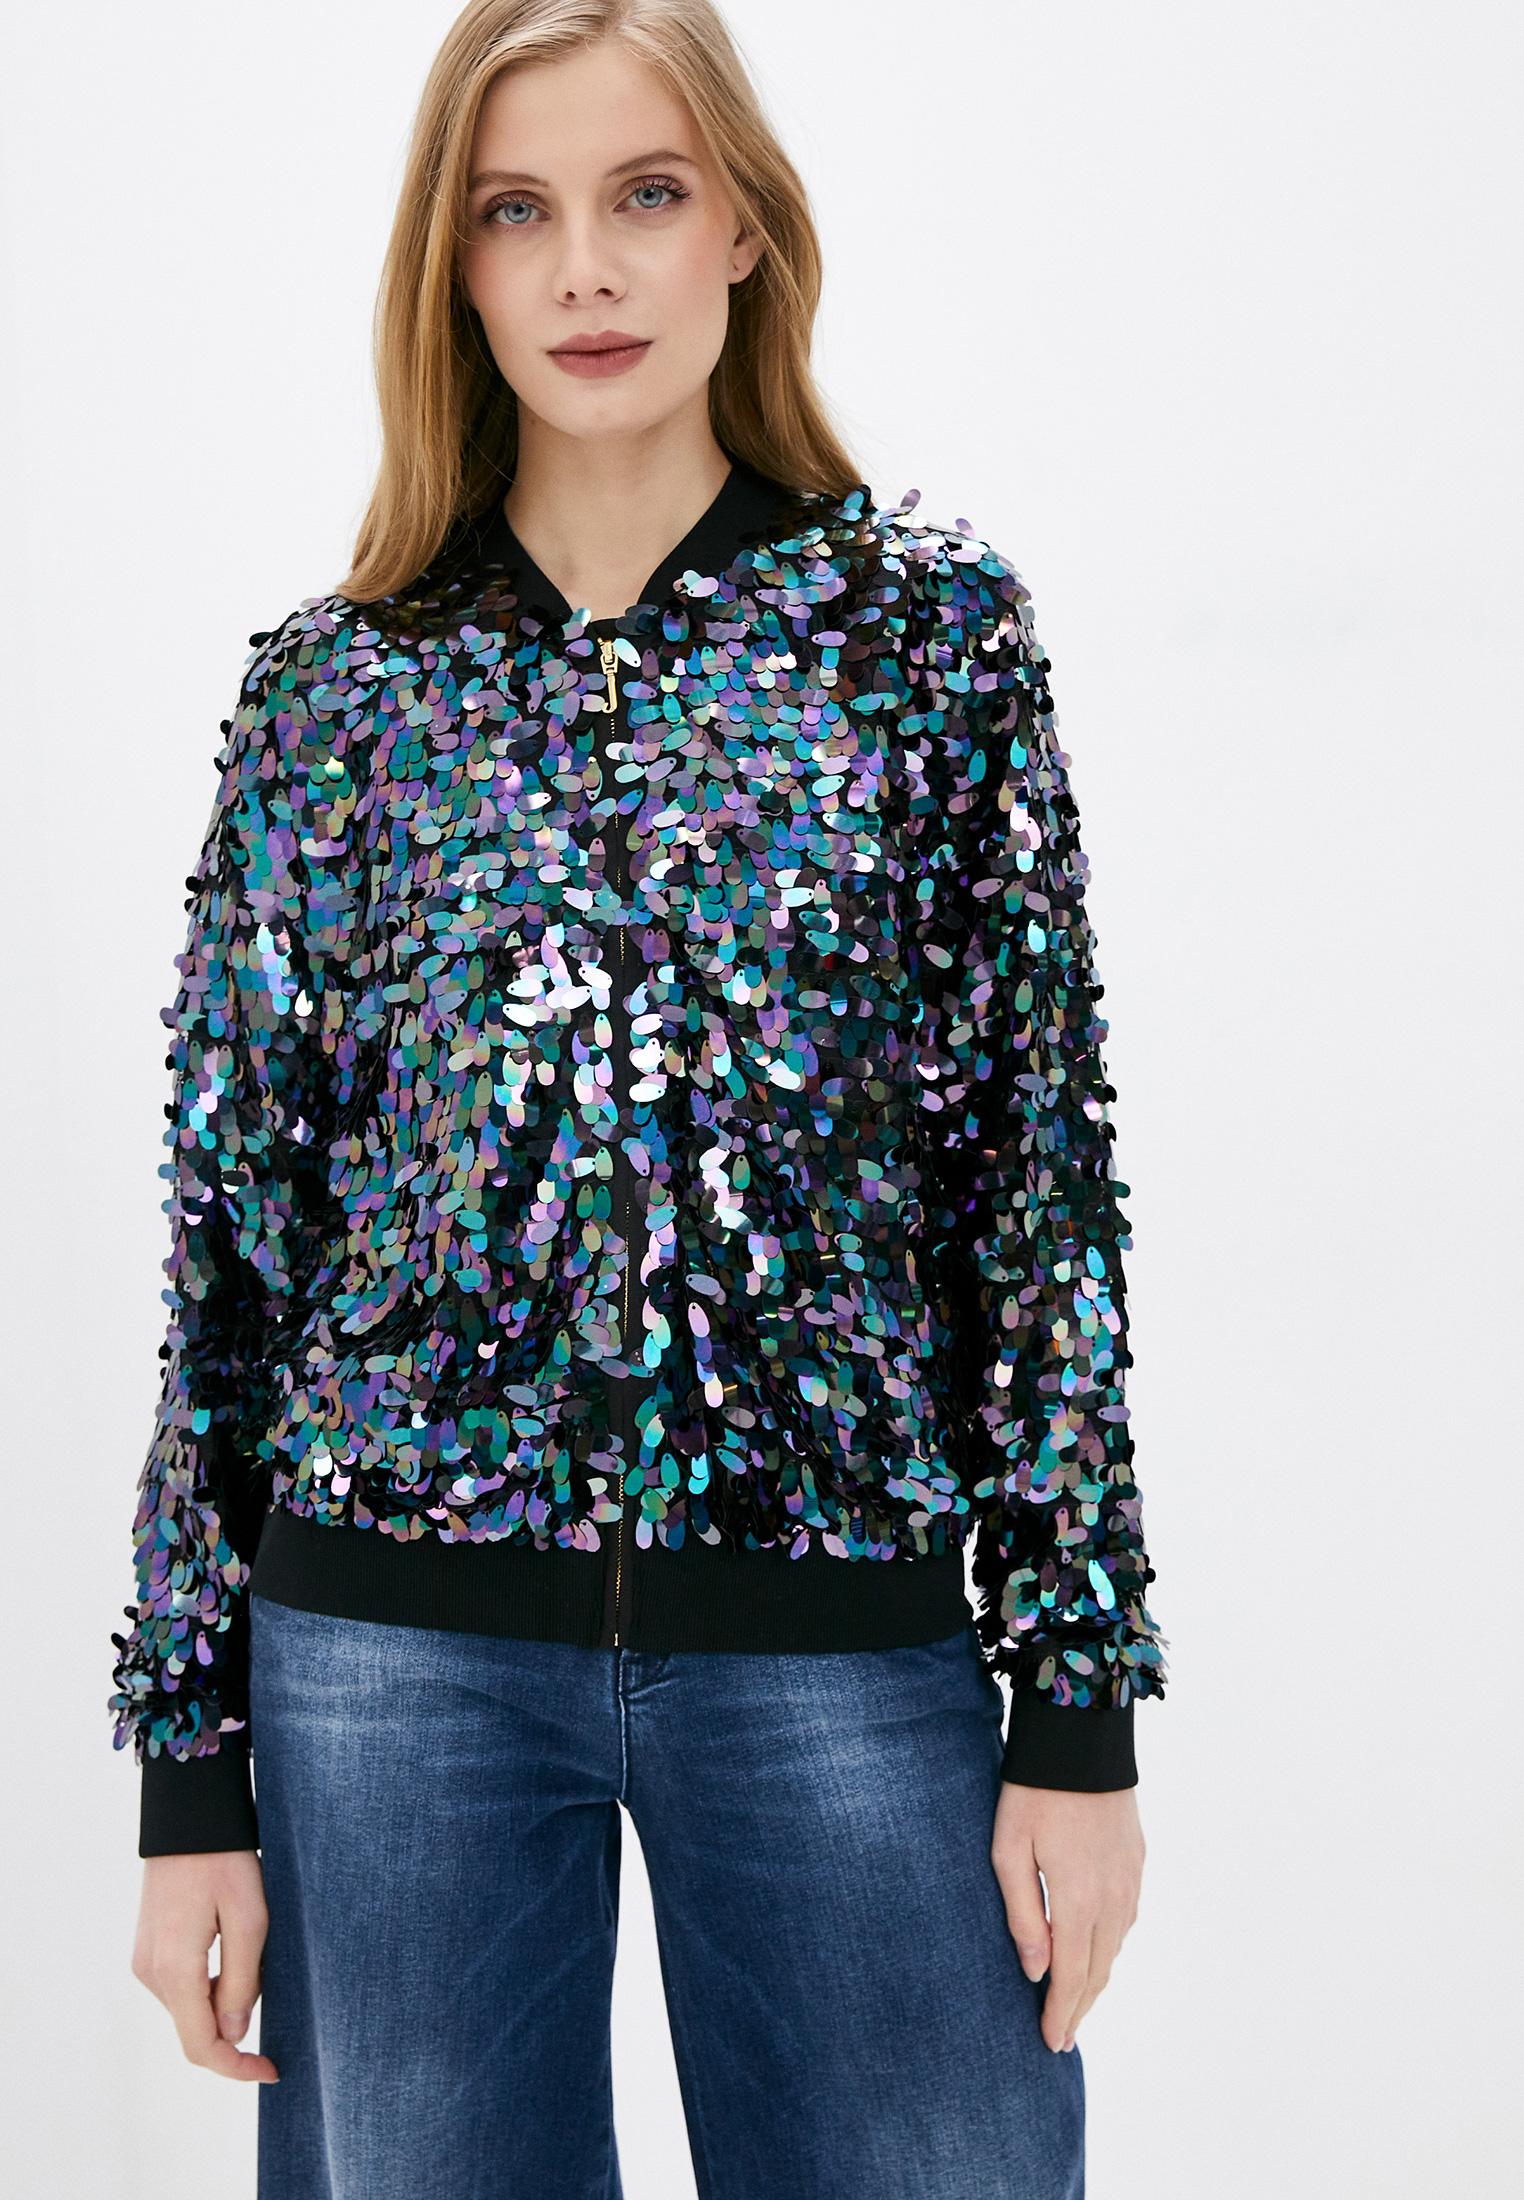 Олимпийка Juicy Couture (Джуси Кутюр) WFWJ204922